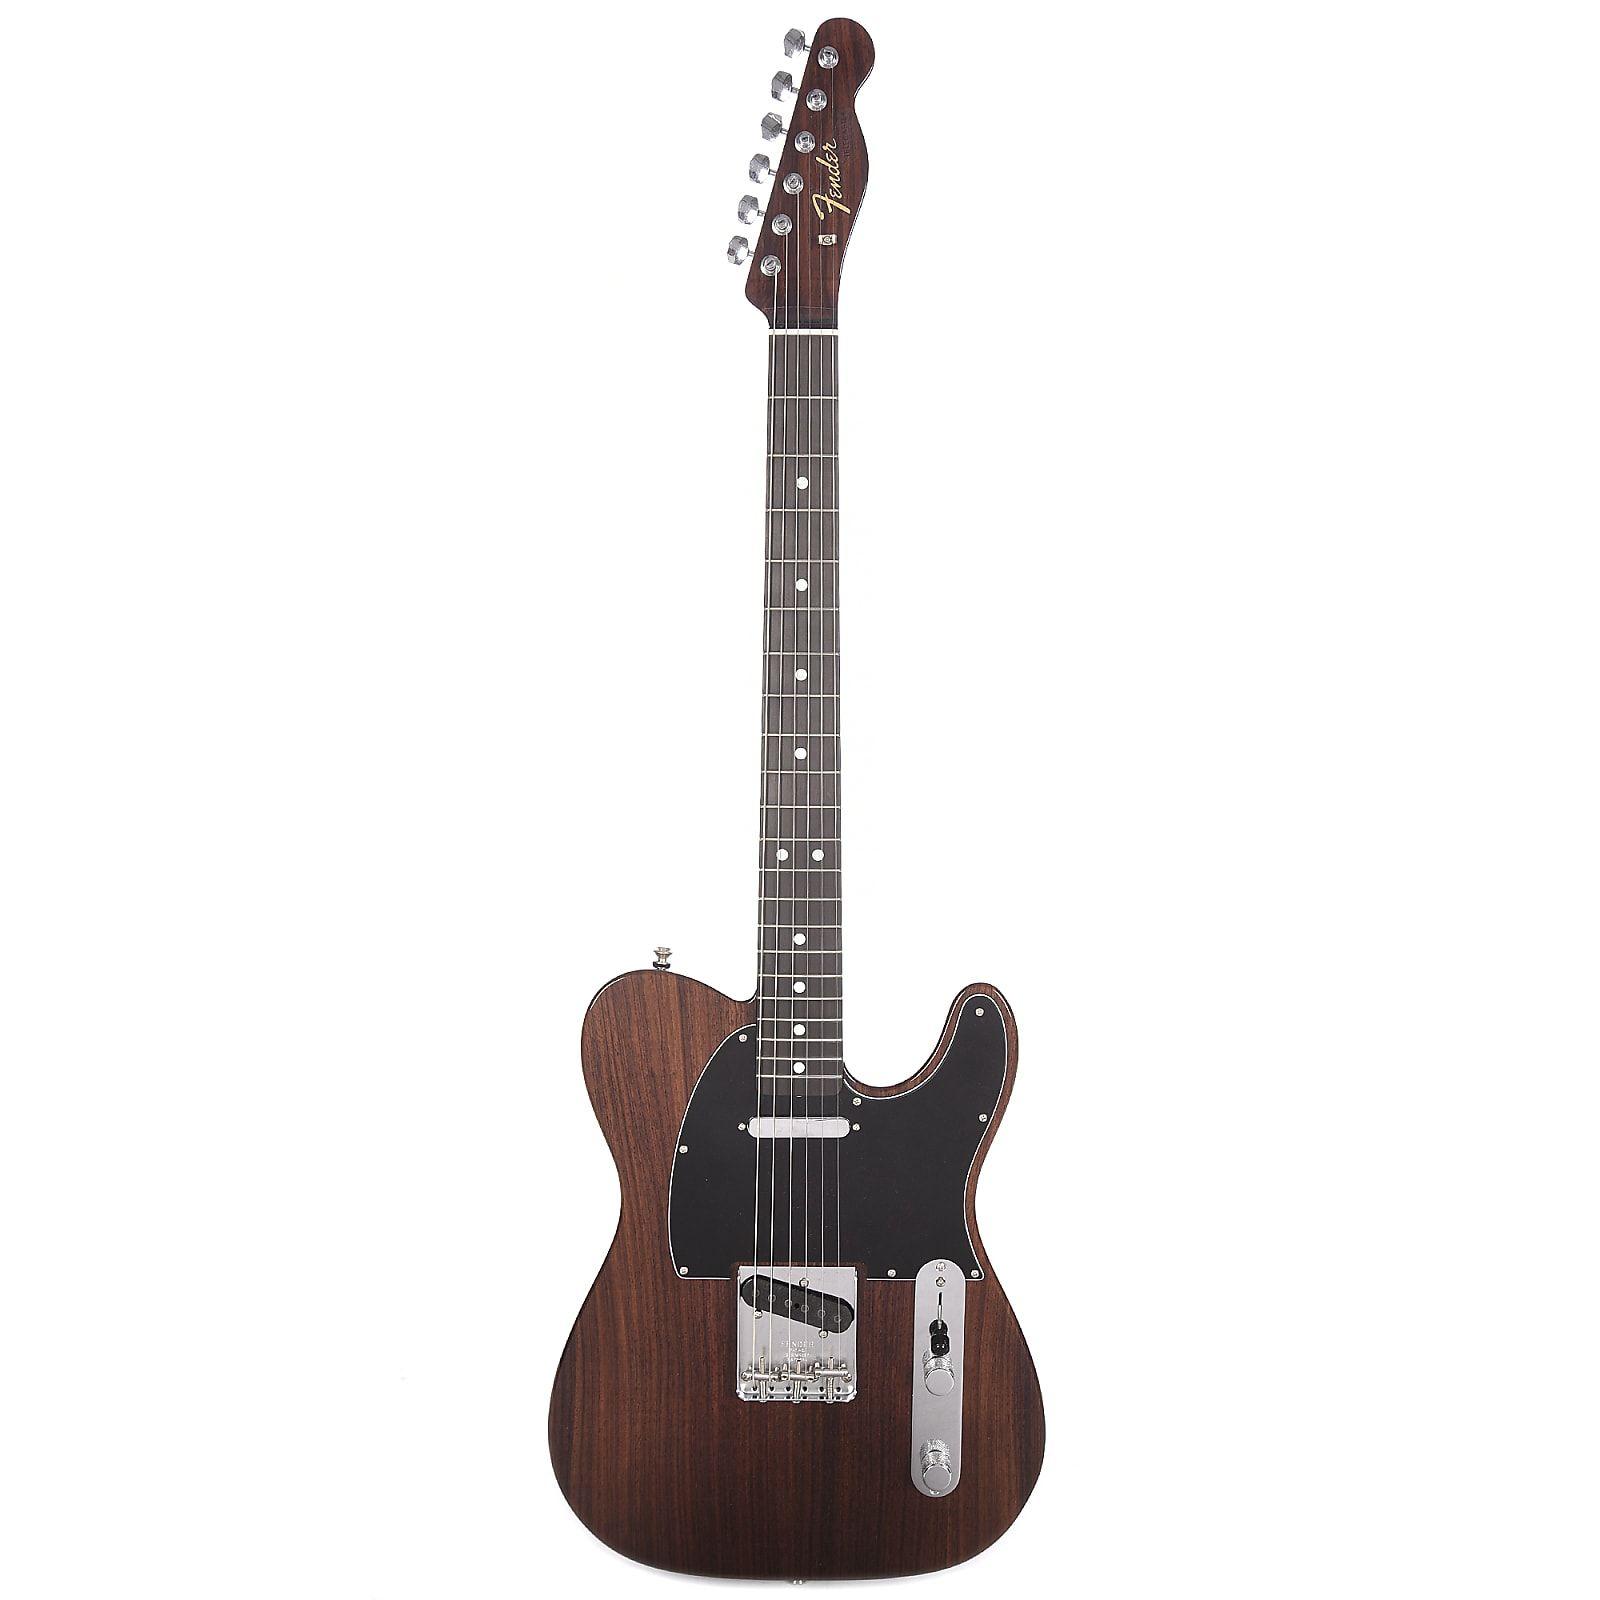 Fender Custom Shop 1967 Rosewood Telecaster Lush Closet